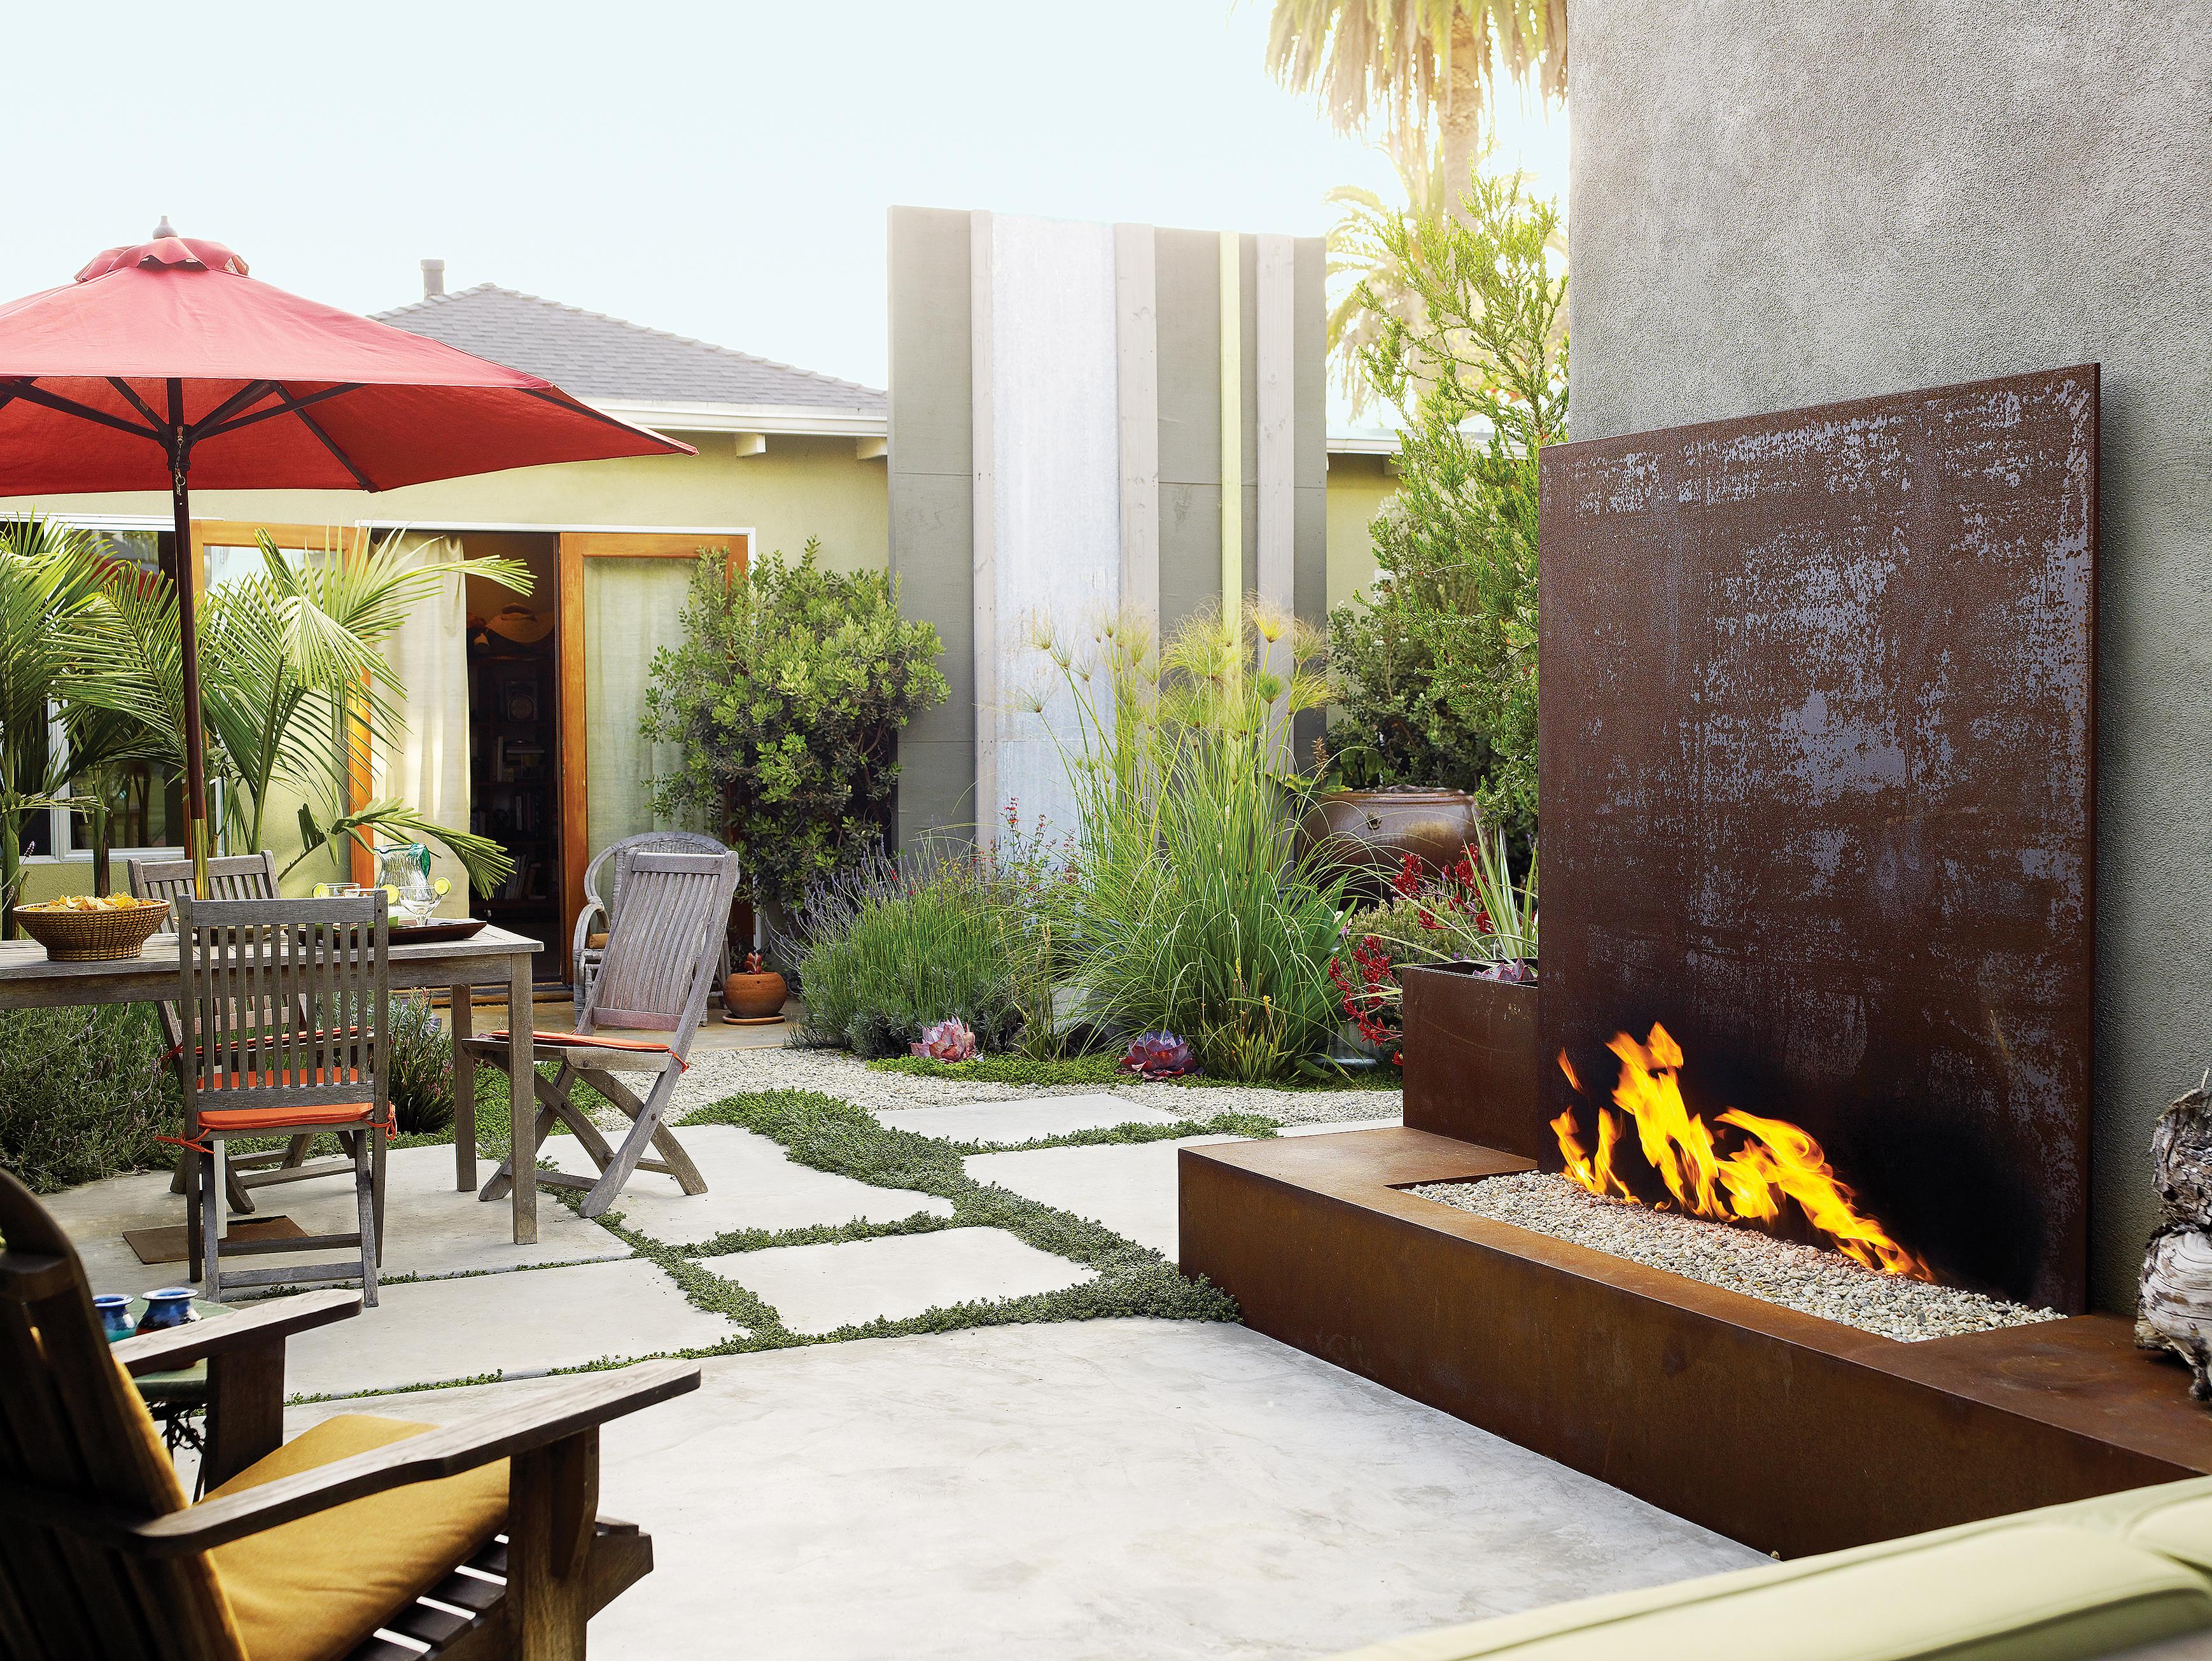 38 Ideas for Firepits - Sunset Magazine